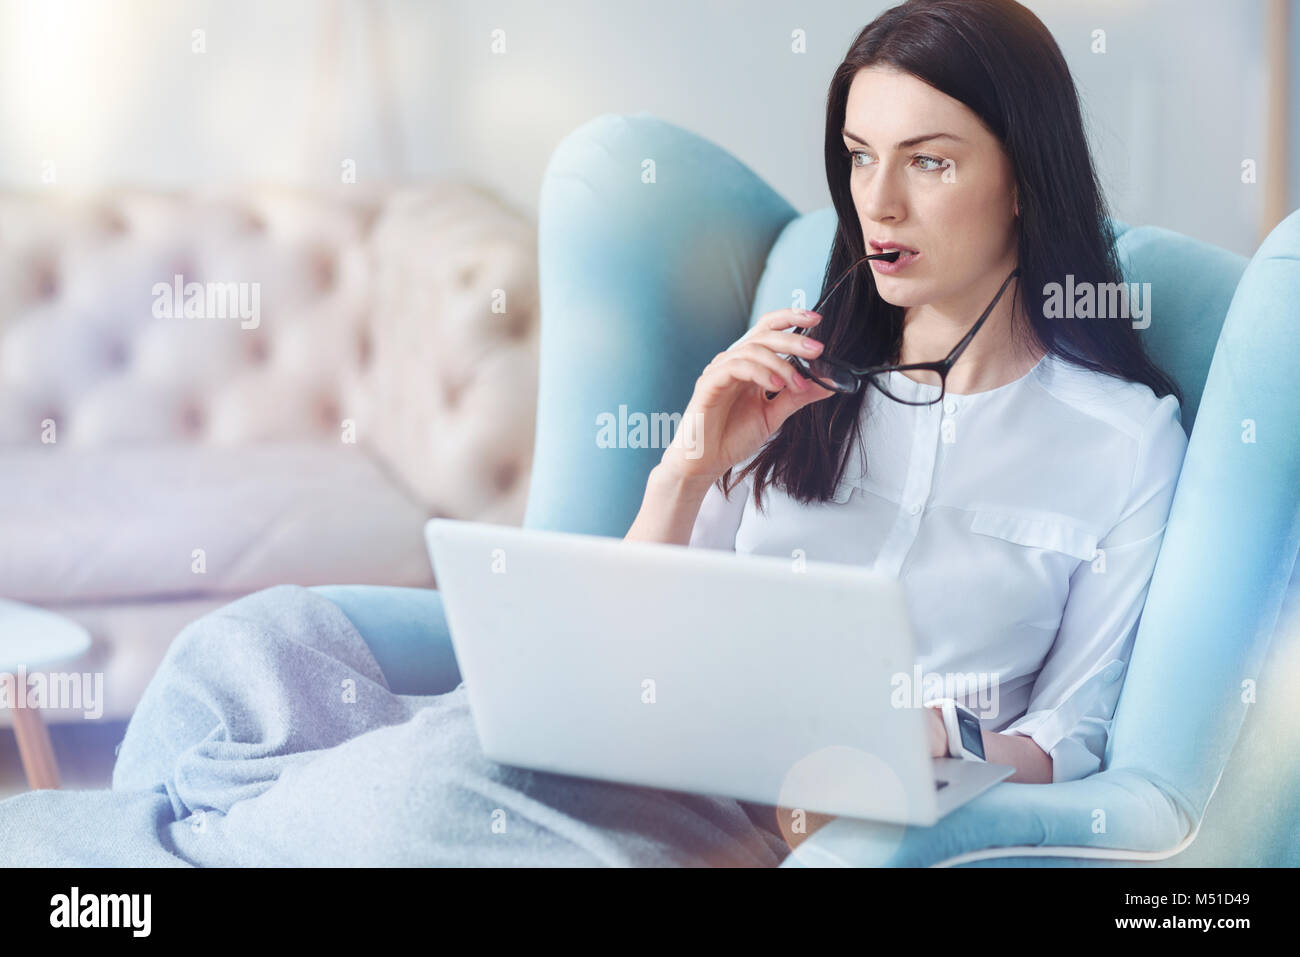 Agotado morena pensando mientras trabaja desde casa Imagen De Stock